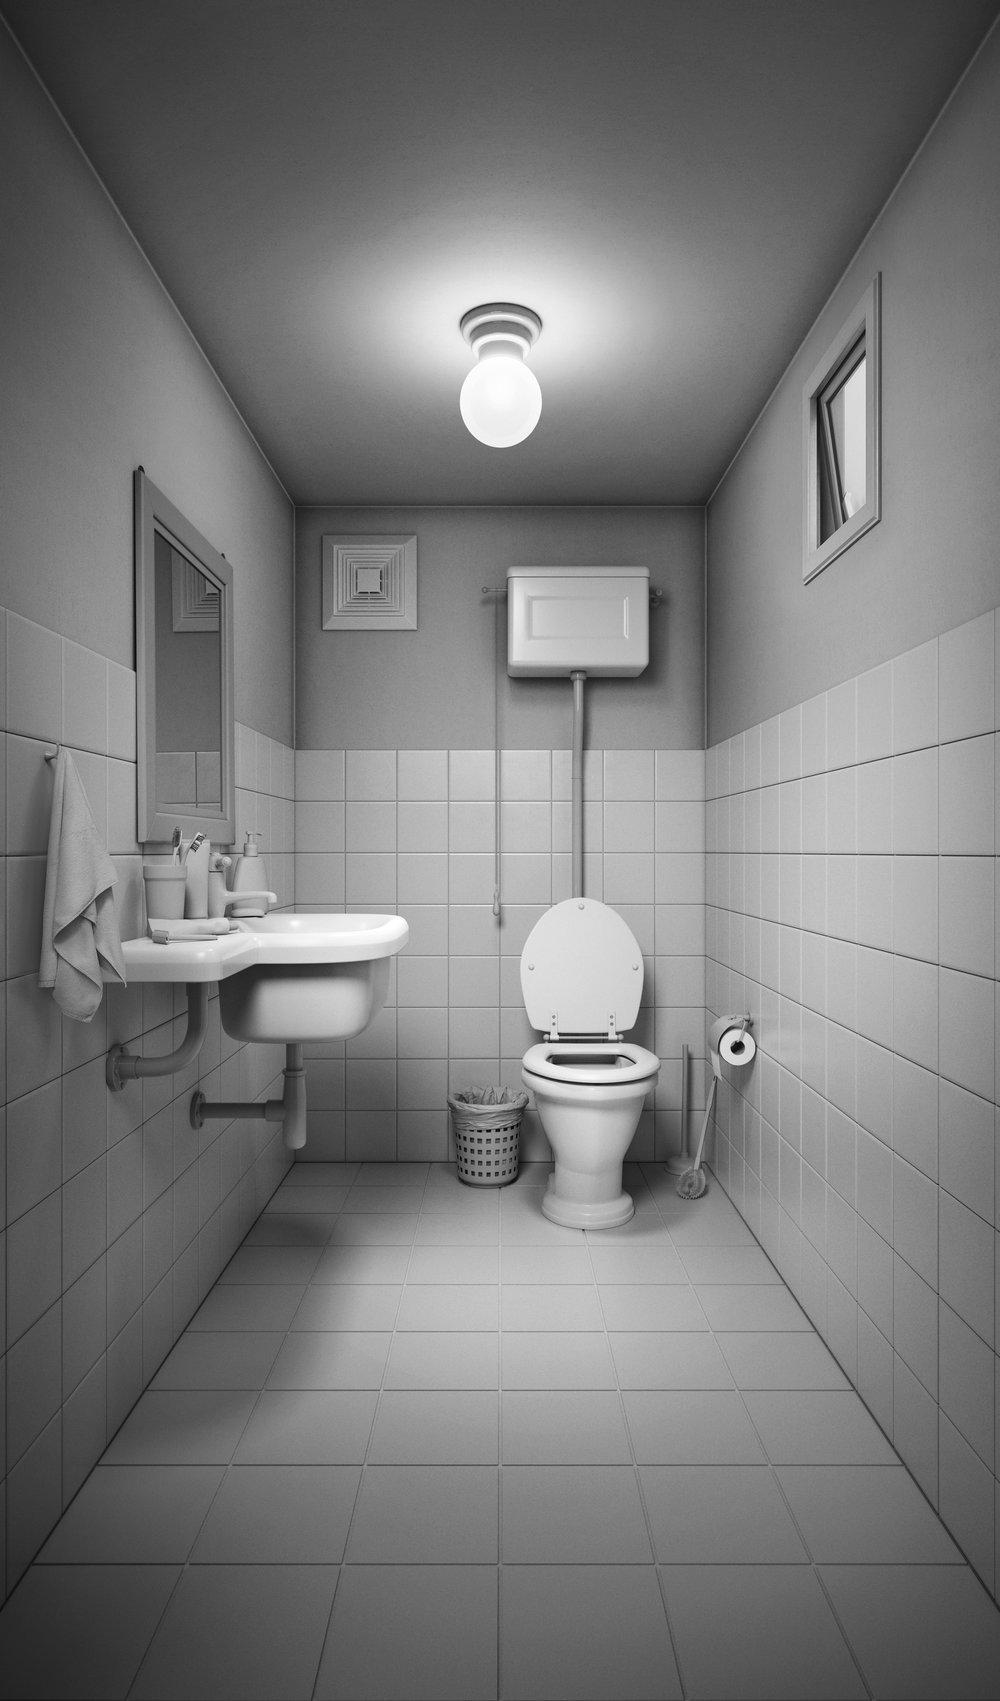 A_Restroom_Model_Final_RGB.jpg